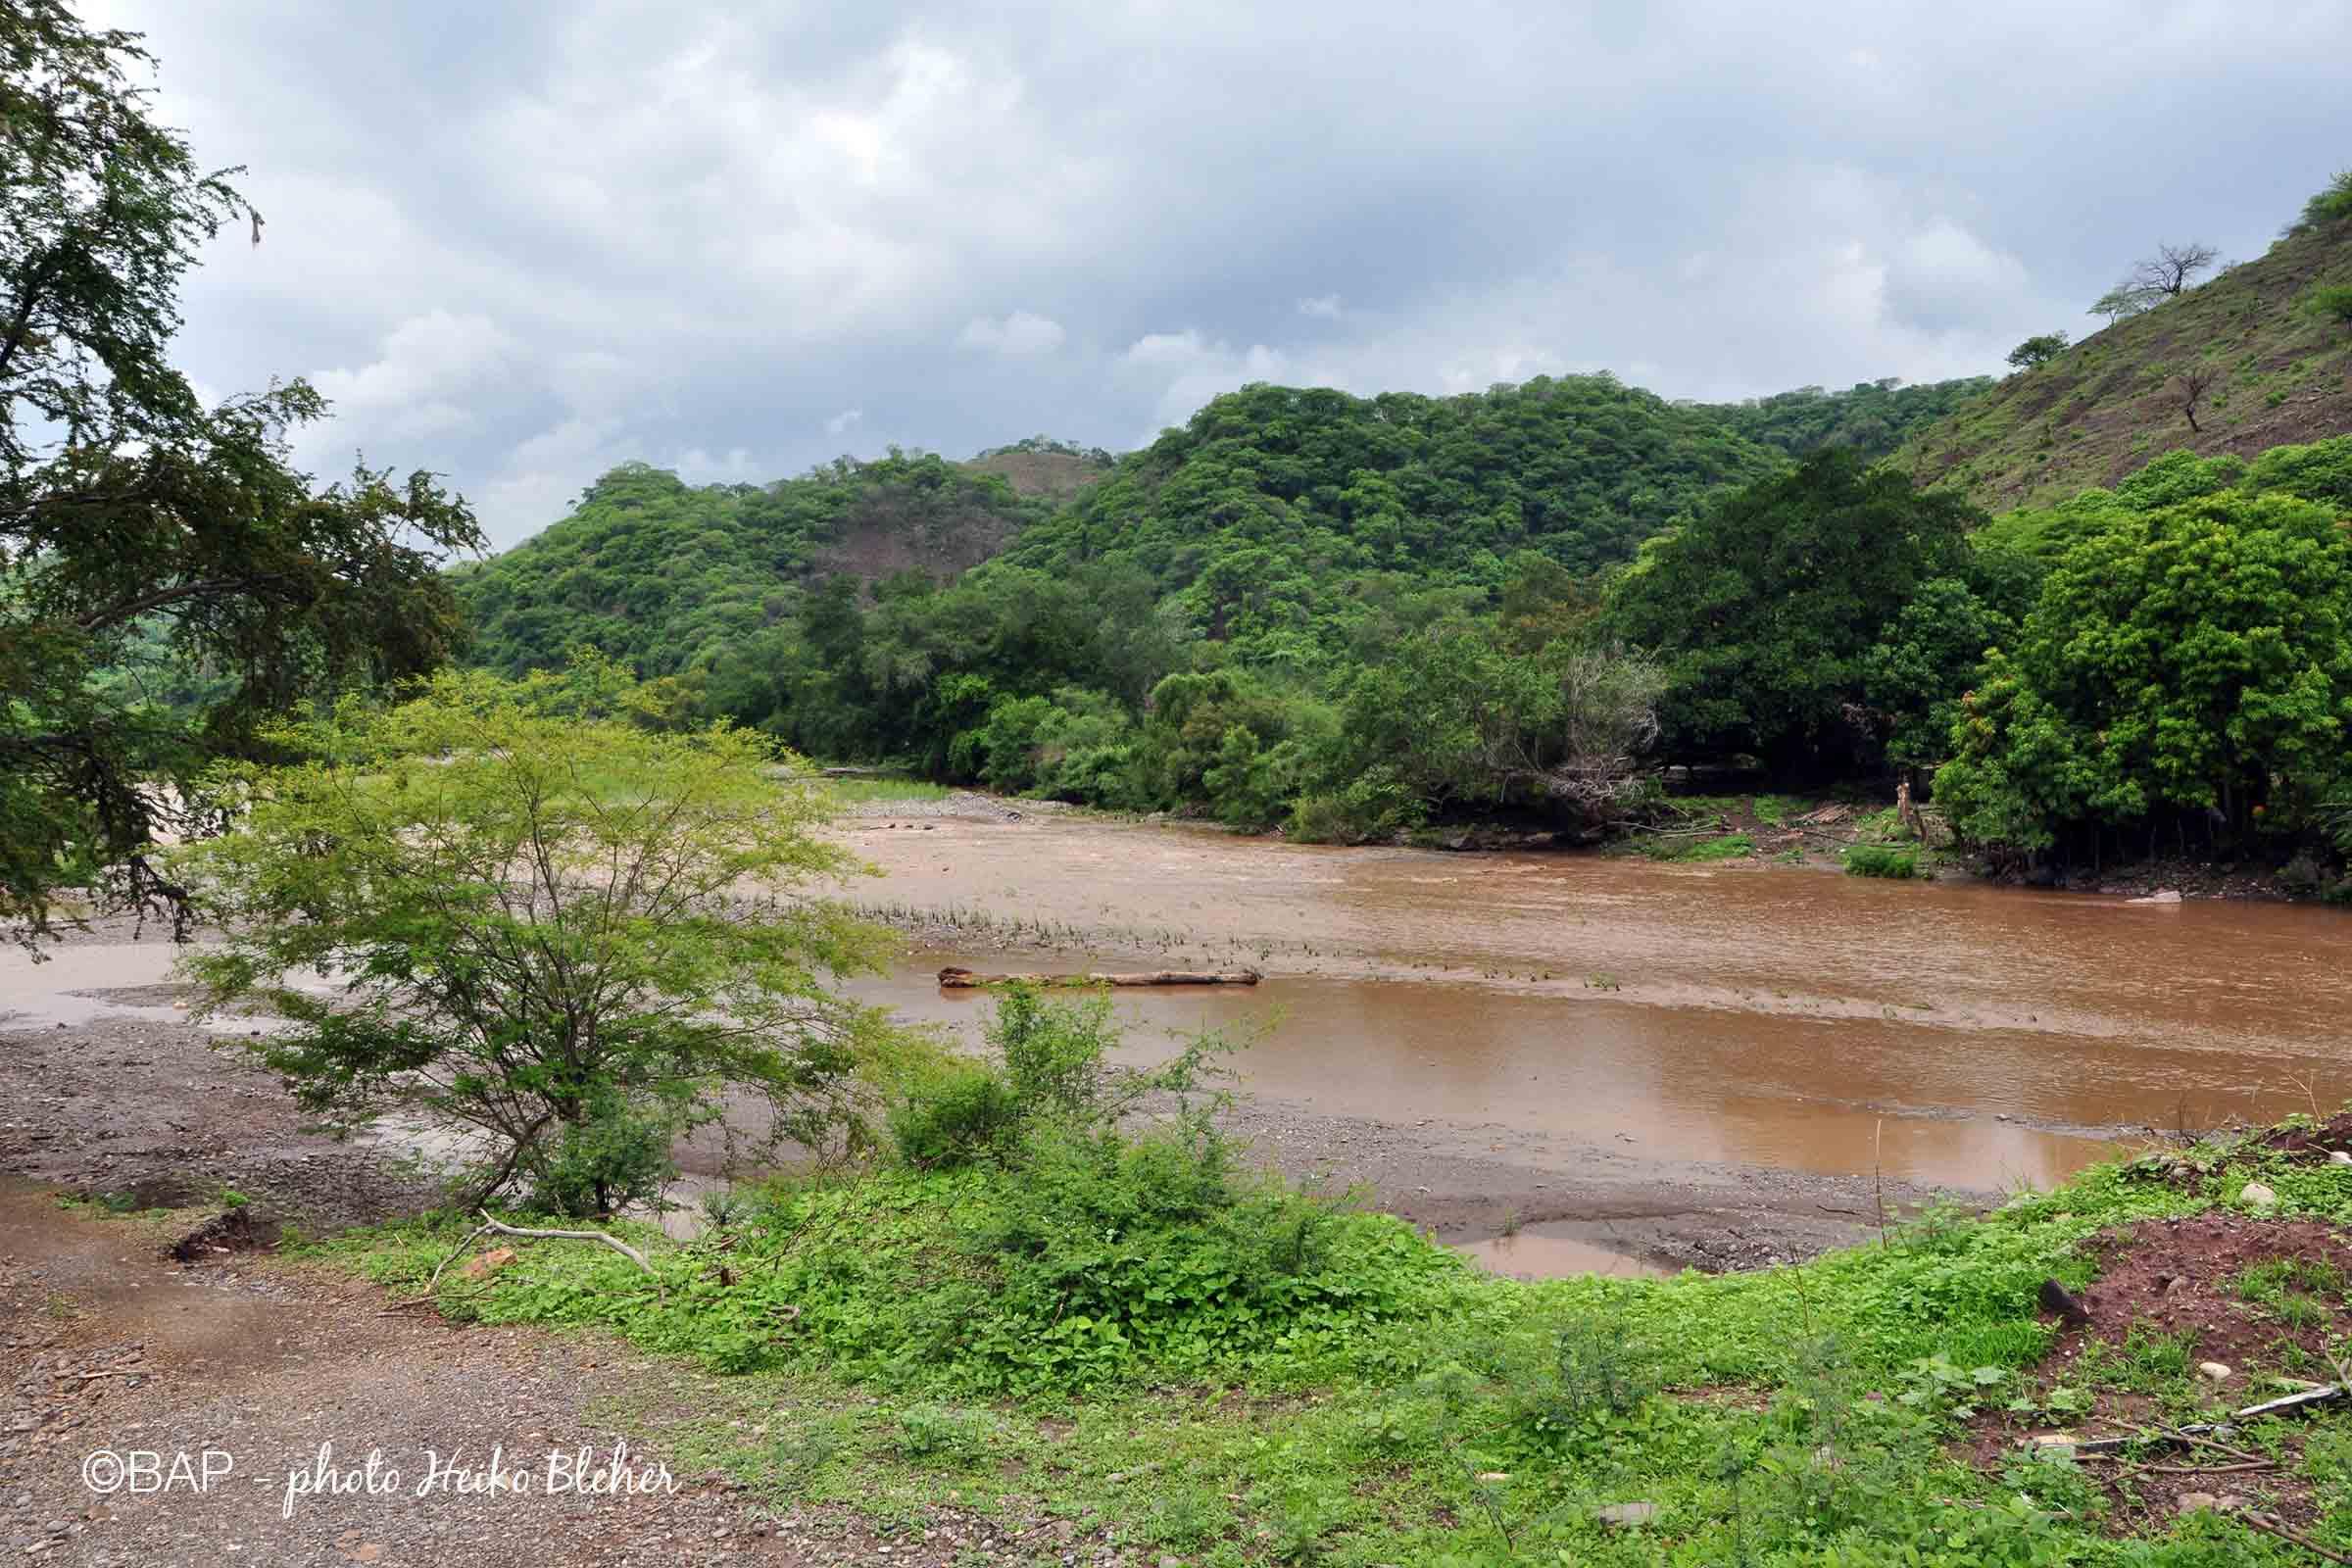 Rio Chiang, Rio Balzas affluent, Mexico. Photo by H. Bleher